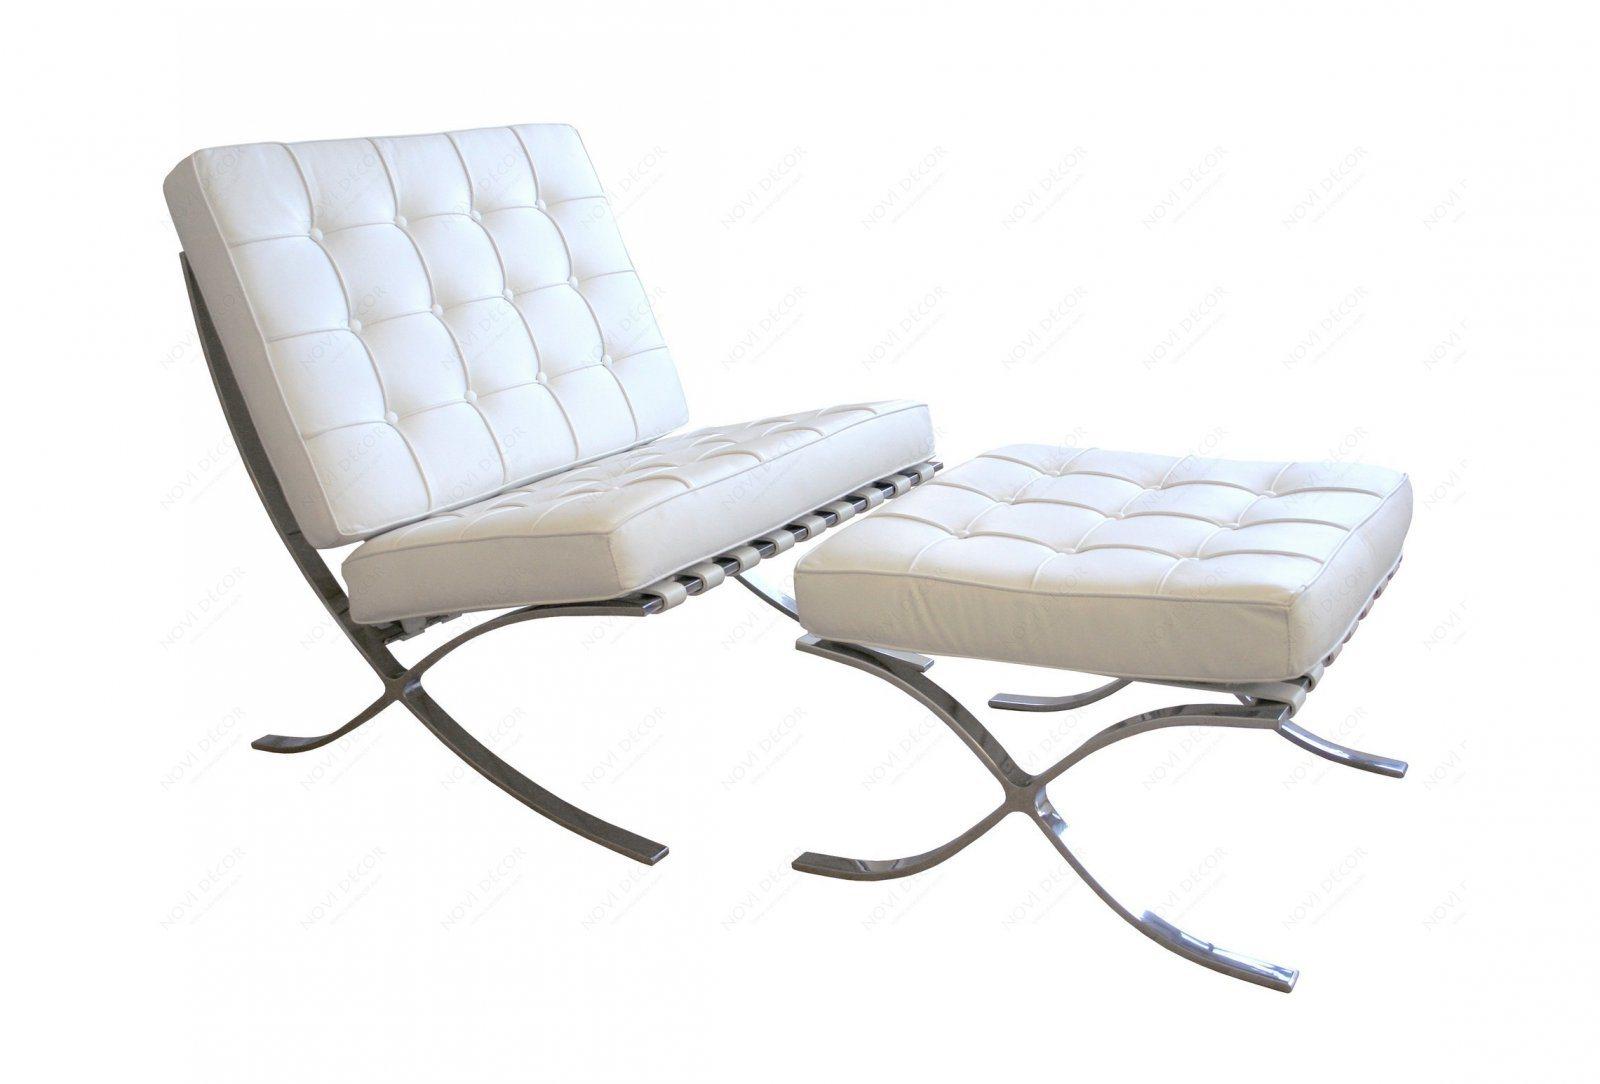 cadeira-barcelona-de-mies-van-der-rohe